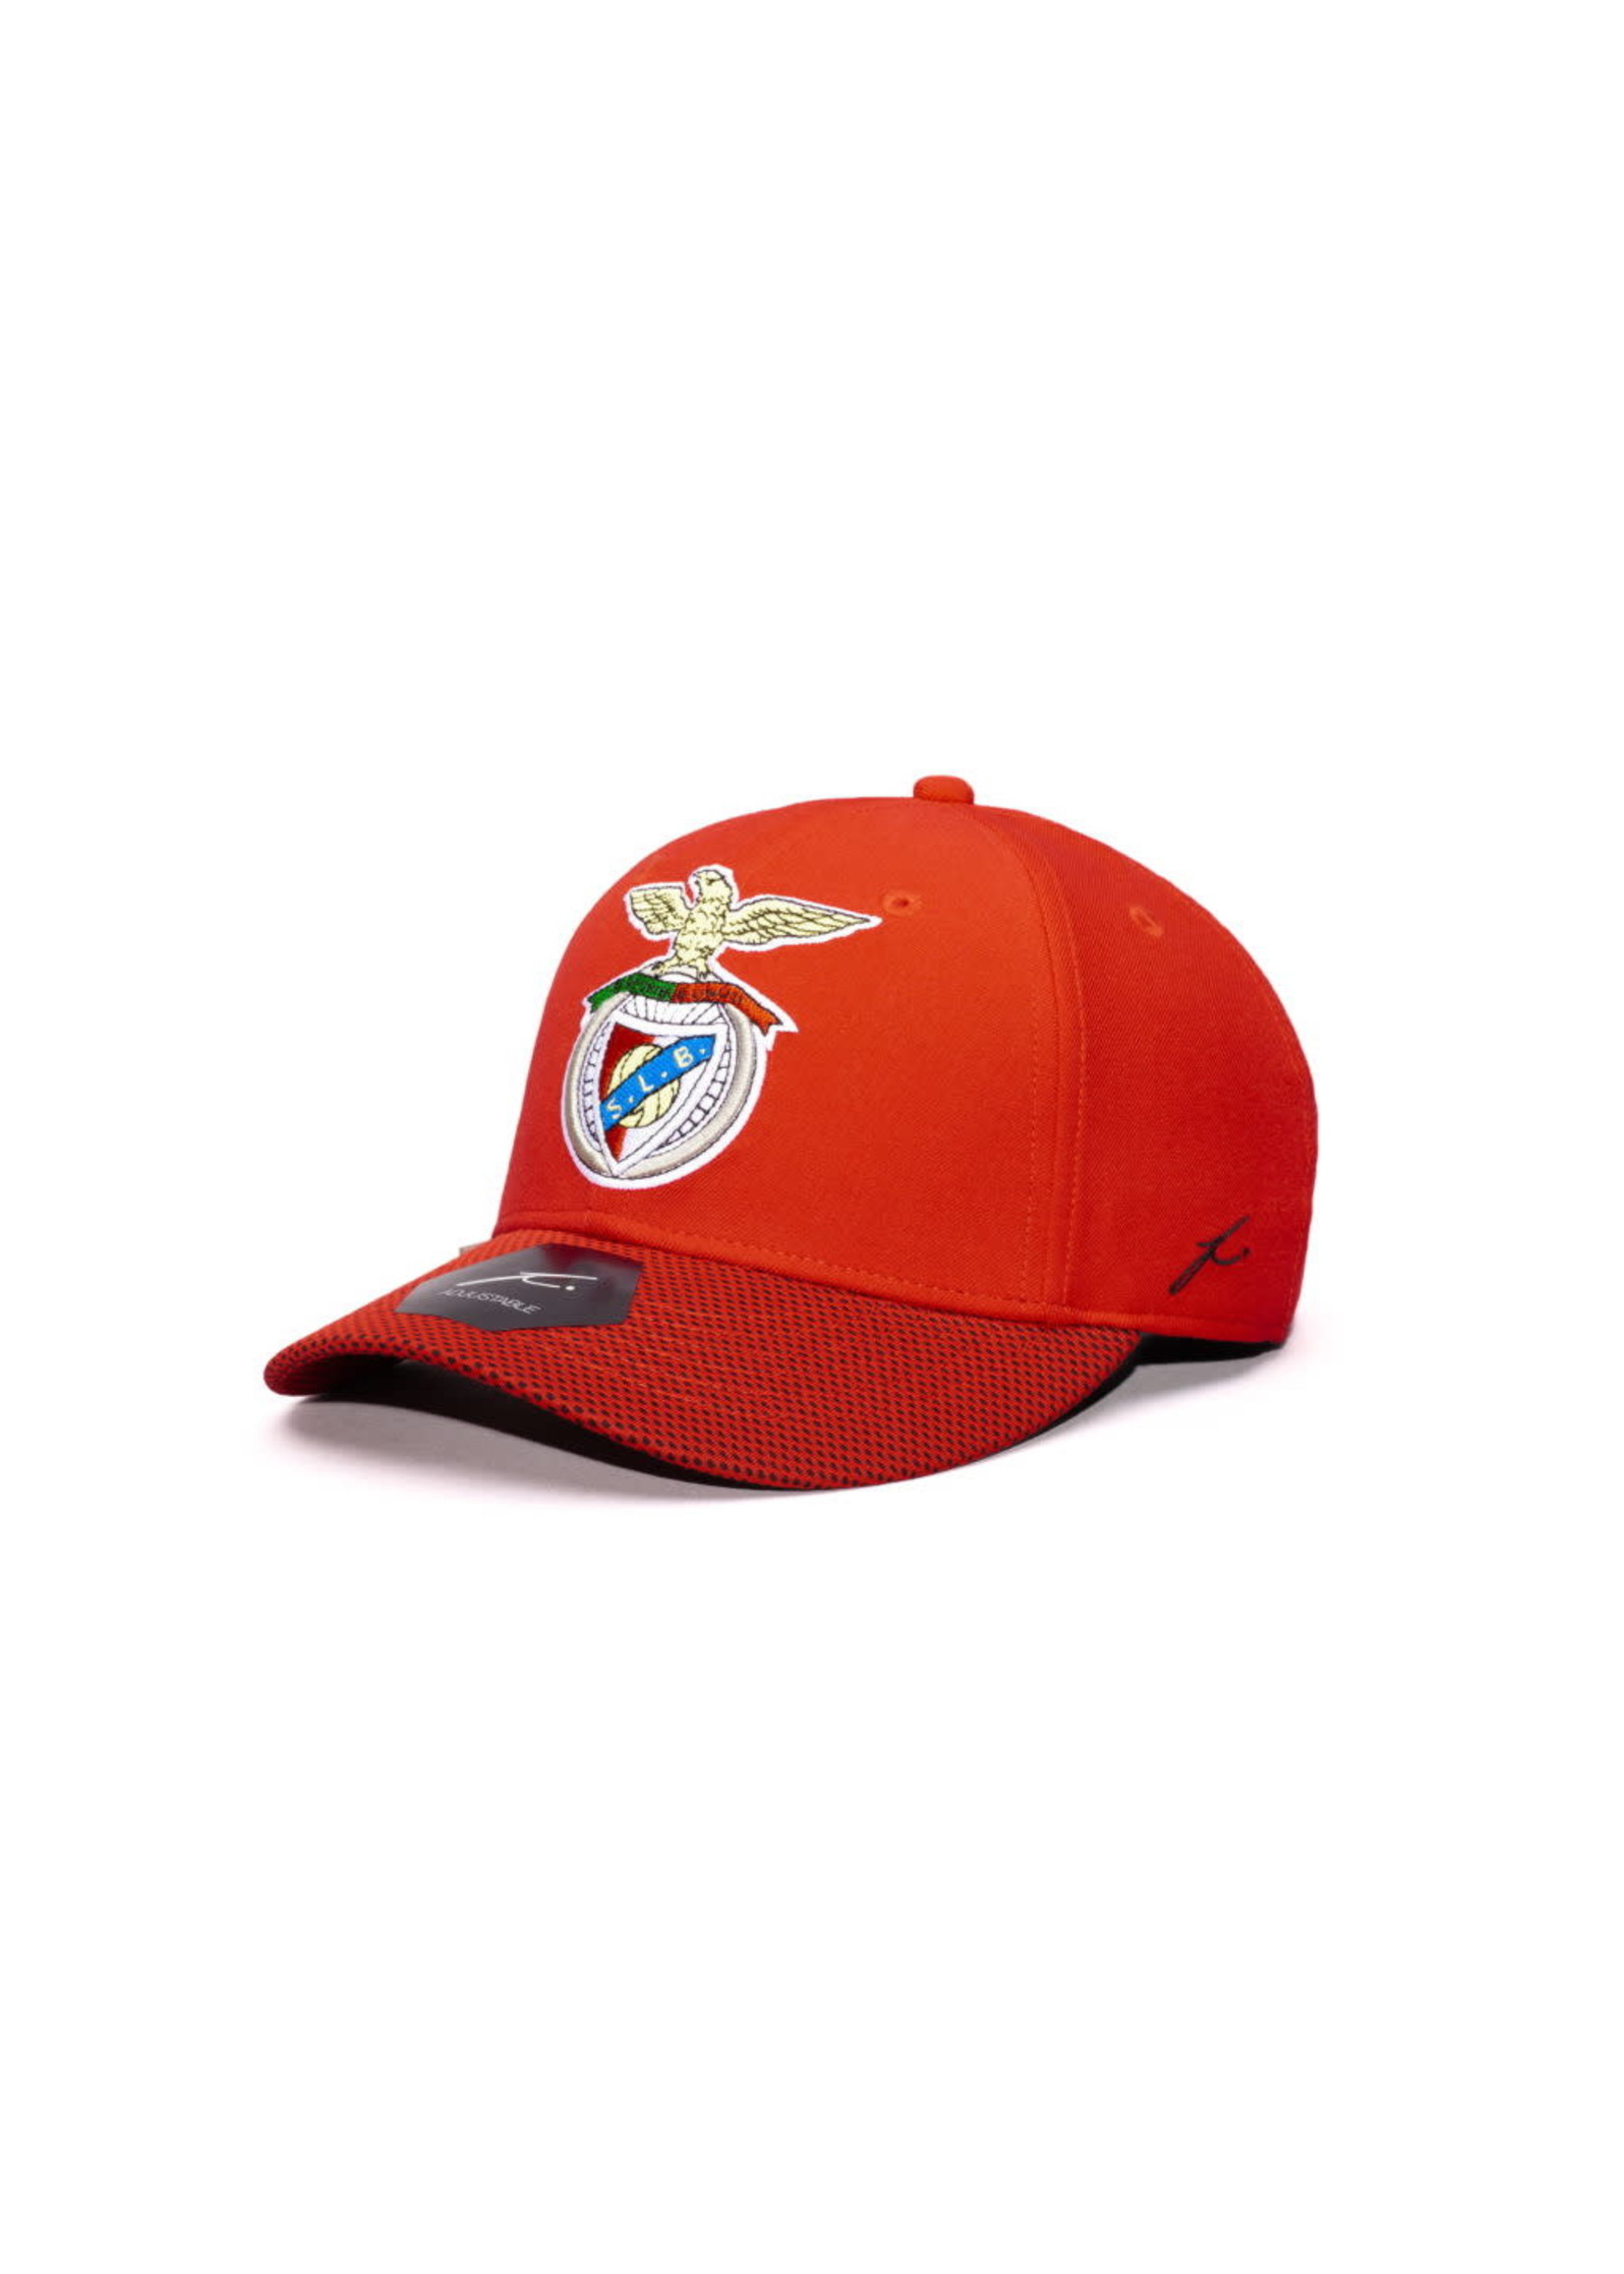 Benfica Premium Red Baseball Hat